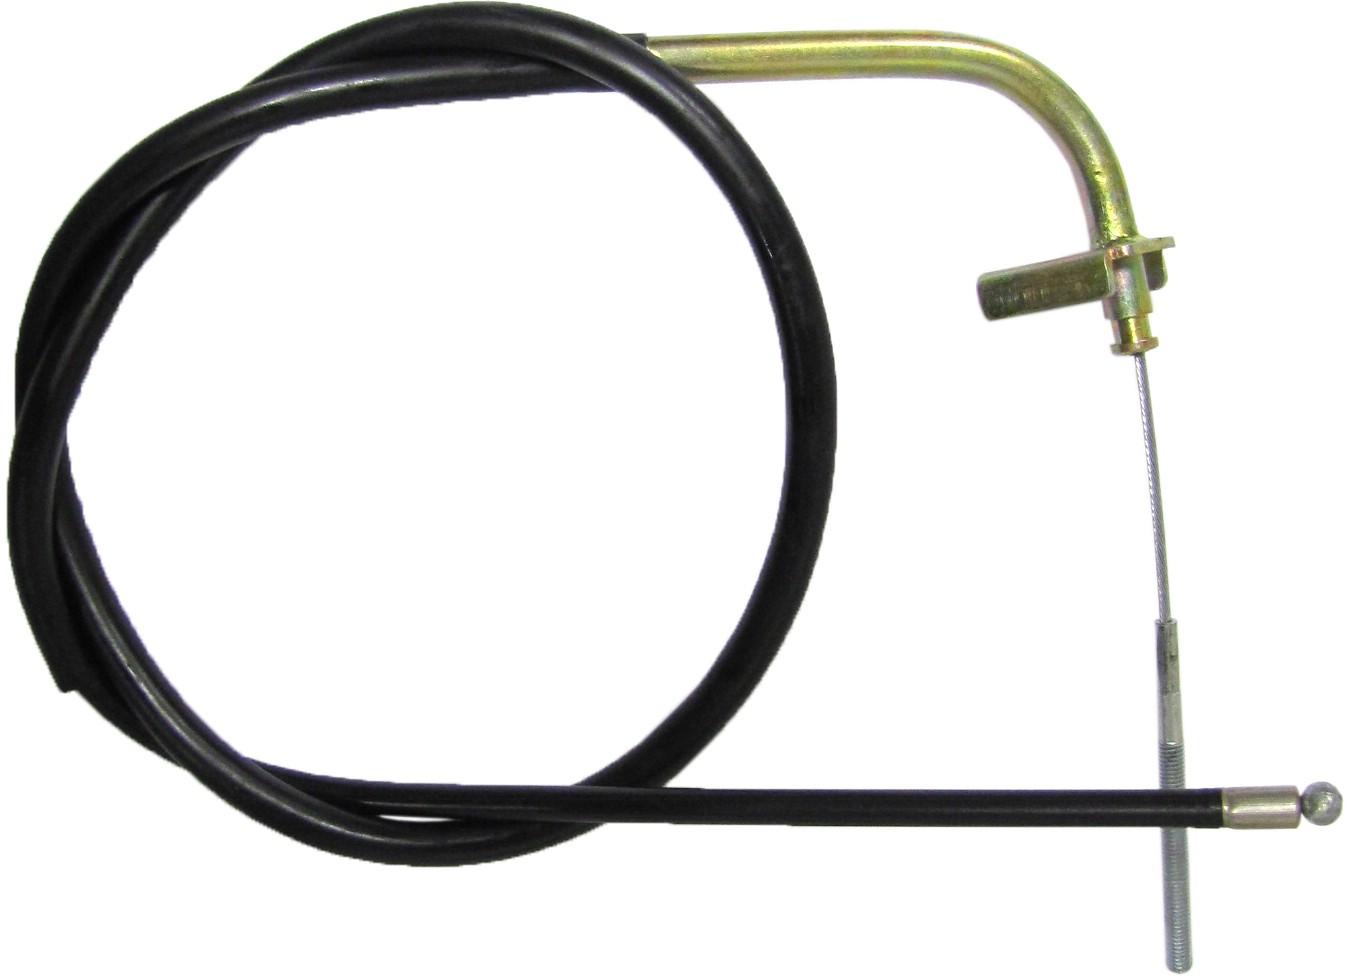 Each Front Right UK Suzuki LT-A 50 Quadmaster 2002-2005 Brake Cable